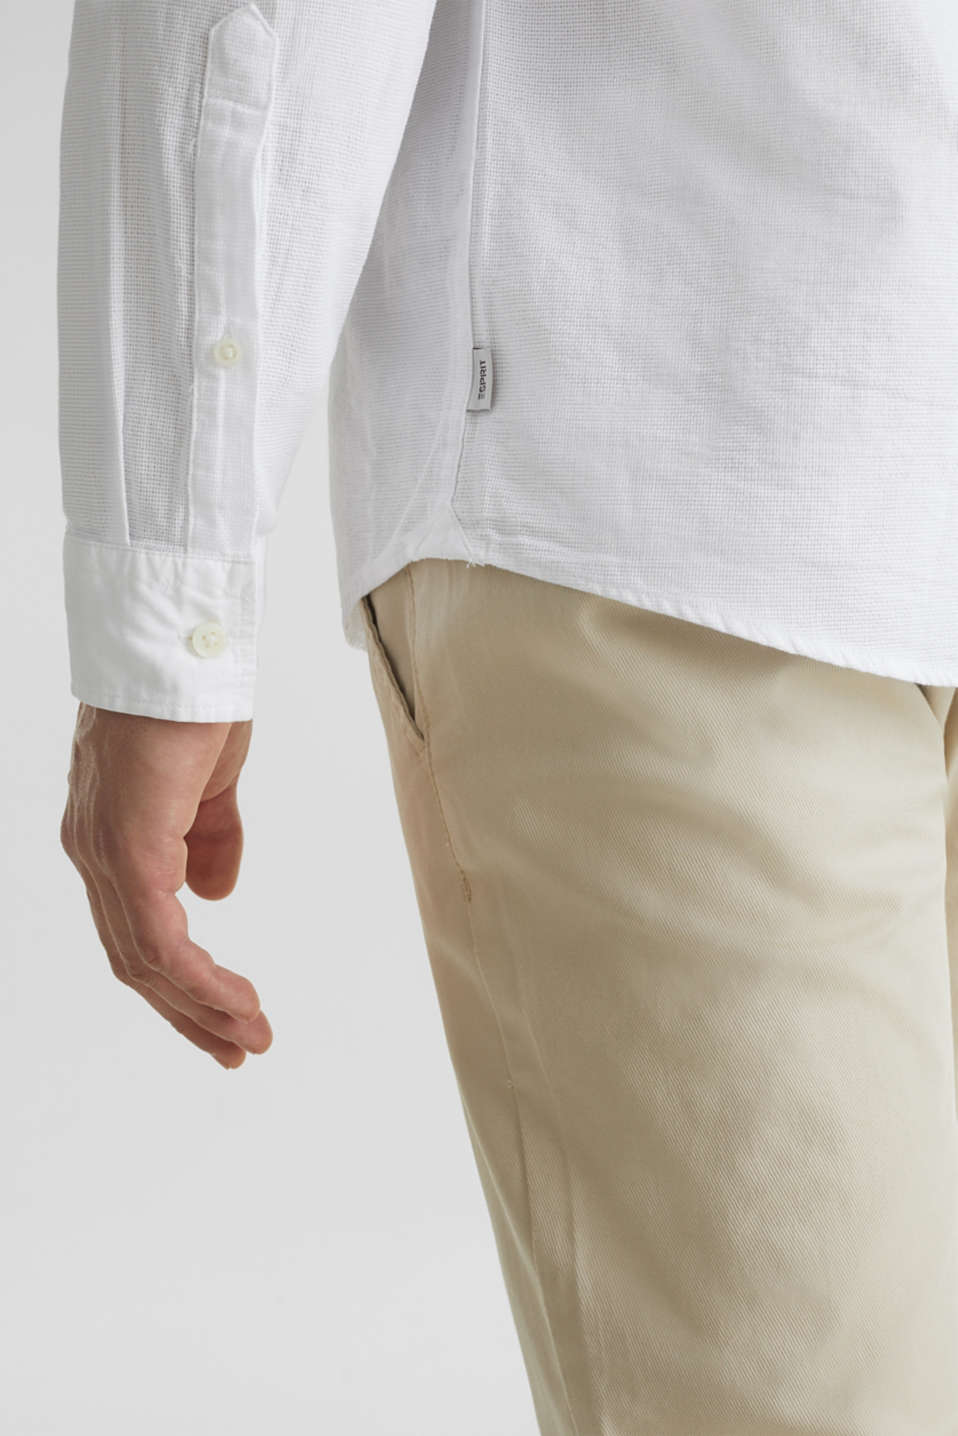 Textured shirt made of 100% organic, WHITE 5, detail image number 2